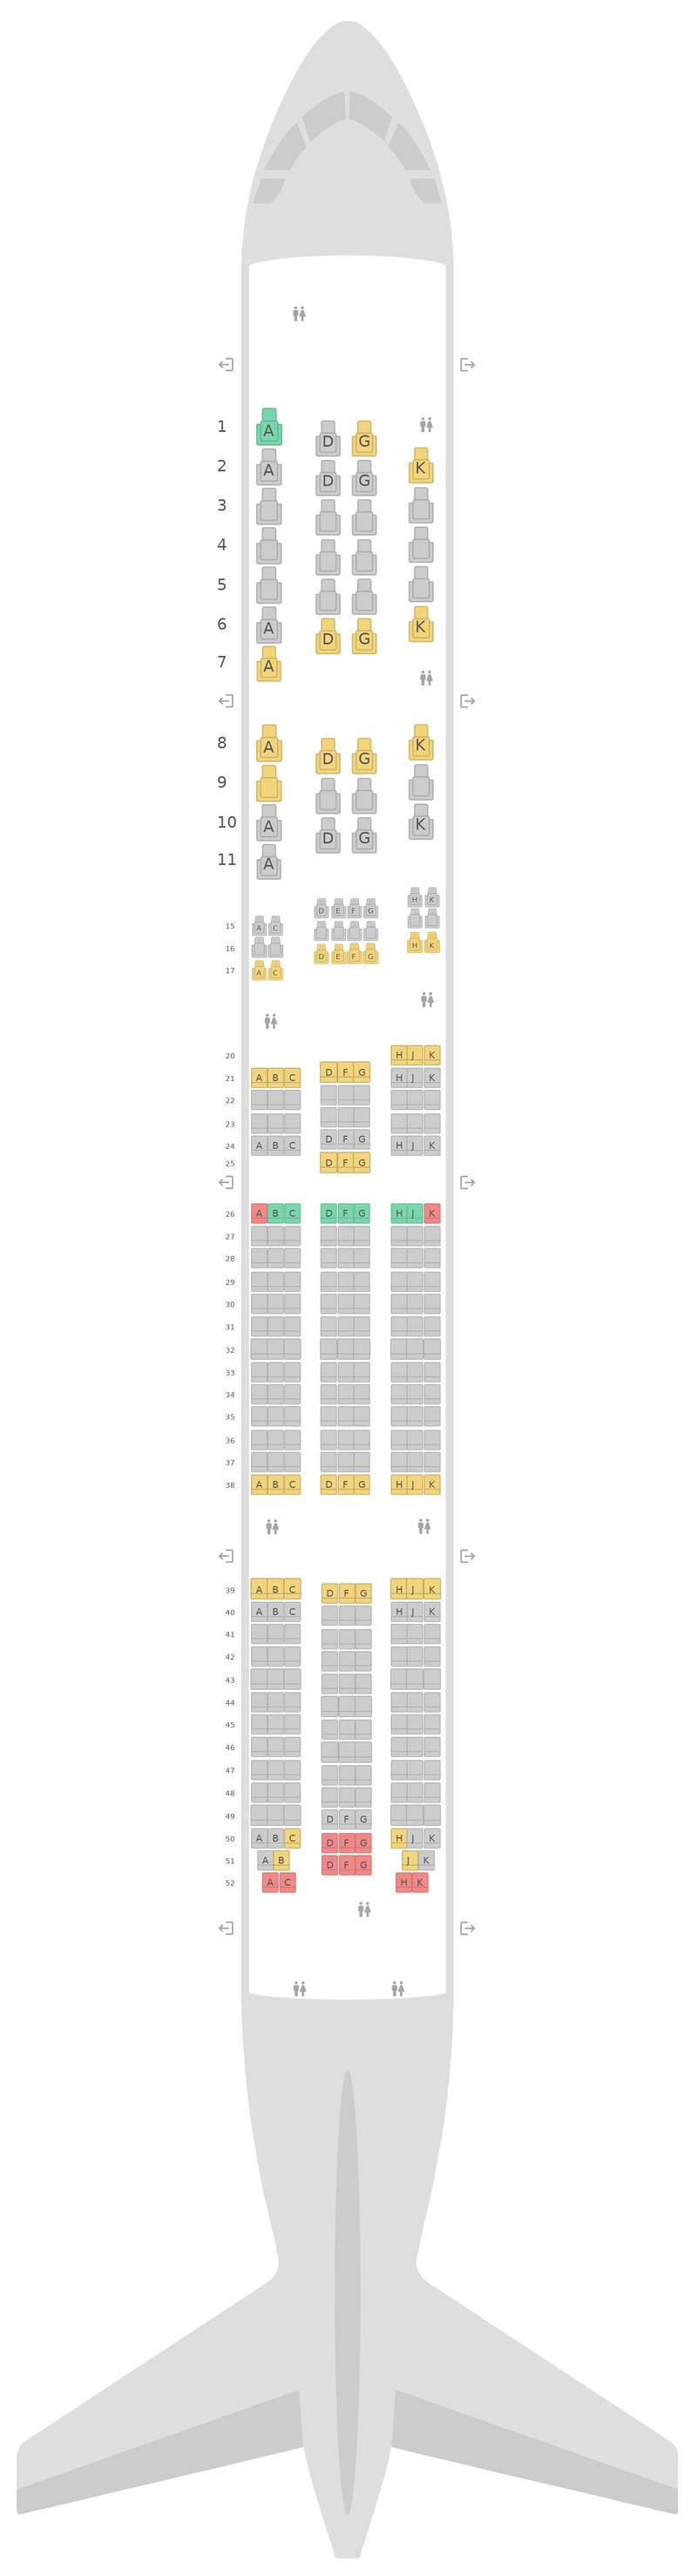 Mapa de asientos Boeing 777-300ER (77W) Virgin Australia